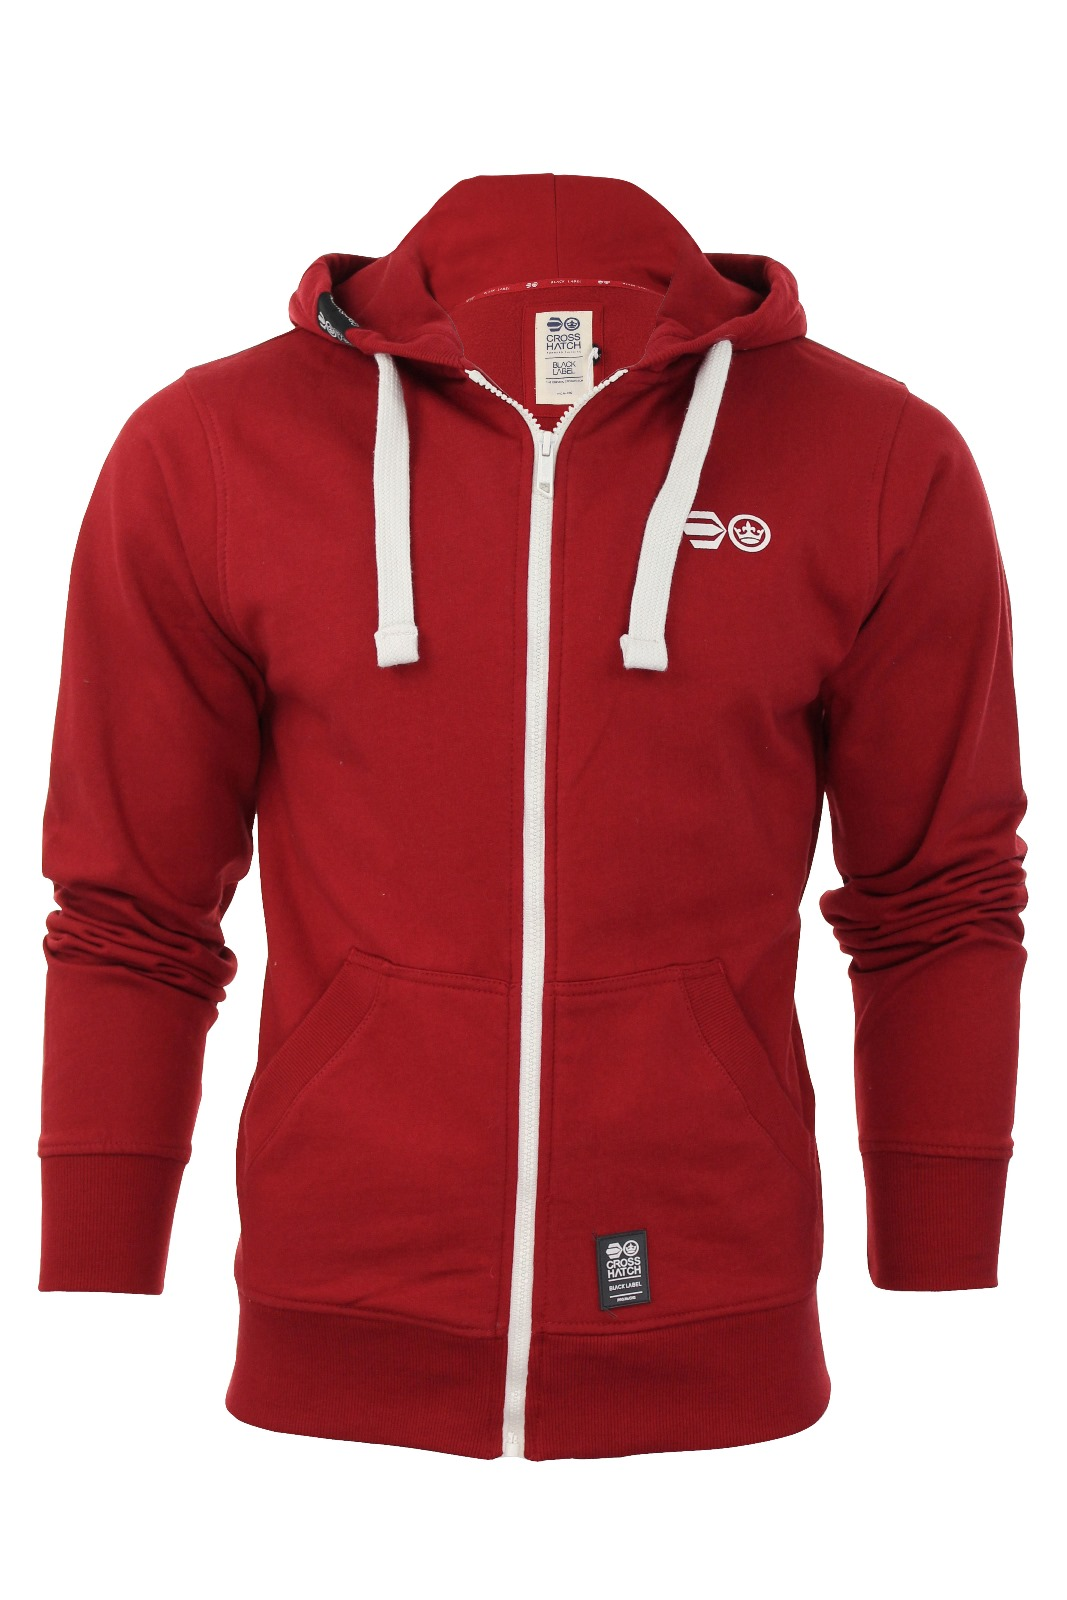 Mens Hoodie Jumper Sweater Zip Throw Crosshatch Gym Sweatshirt ...